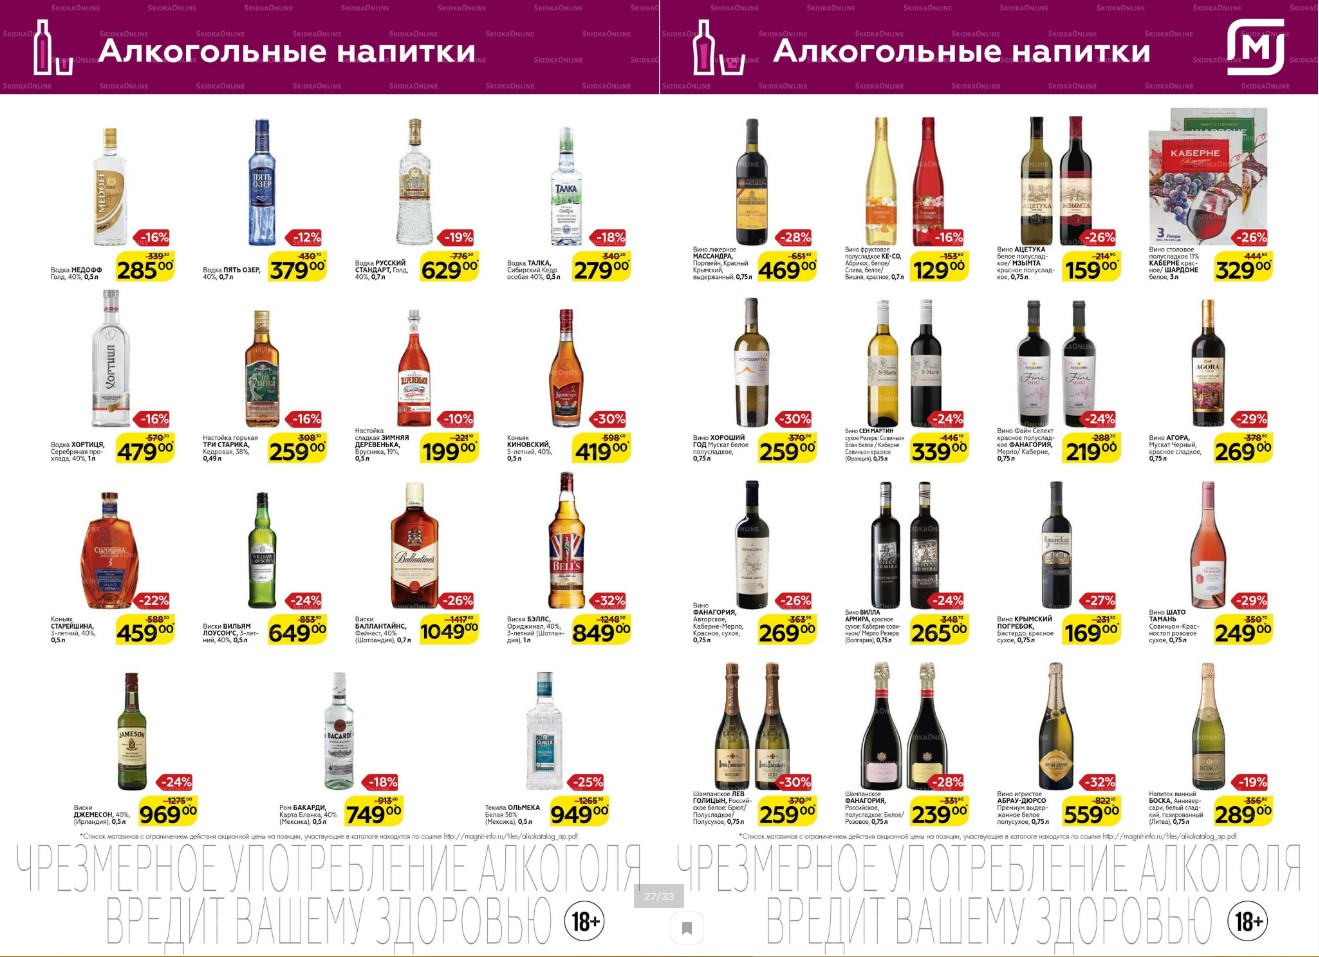 Каталог гипермаркет МАГНИТ 08.05.-21.05.2019 стр.14